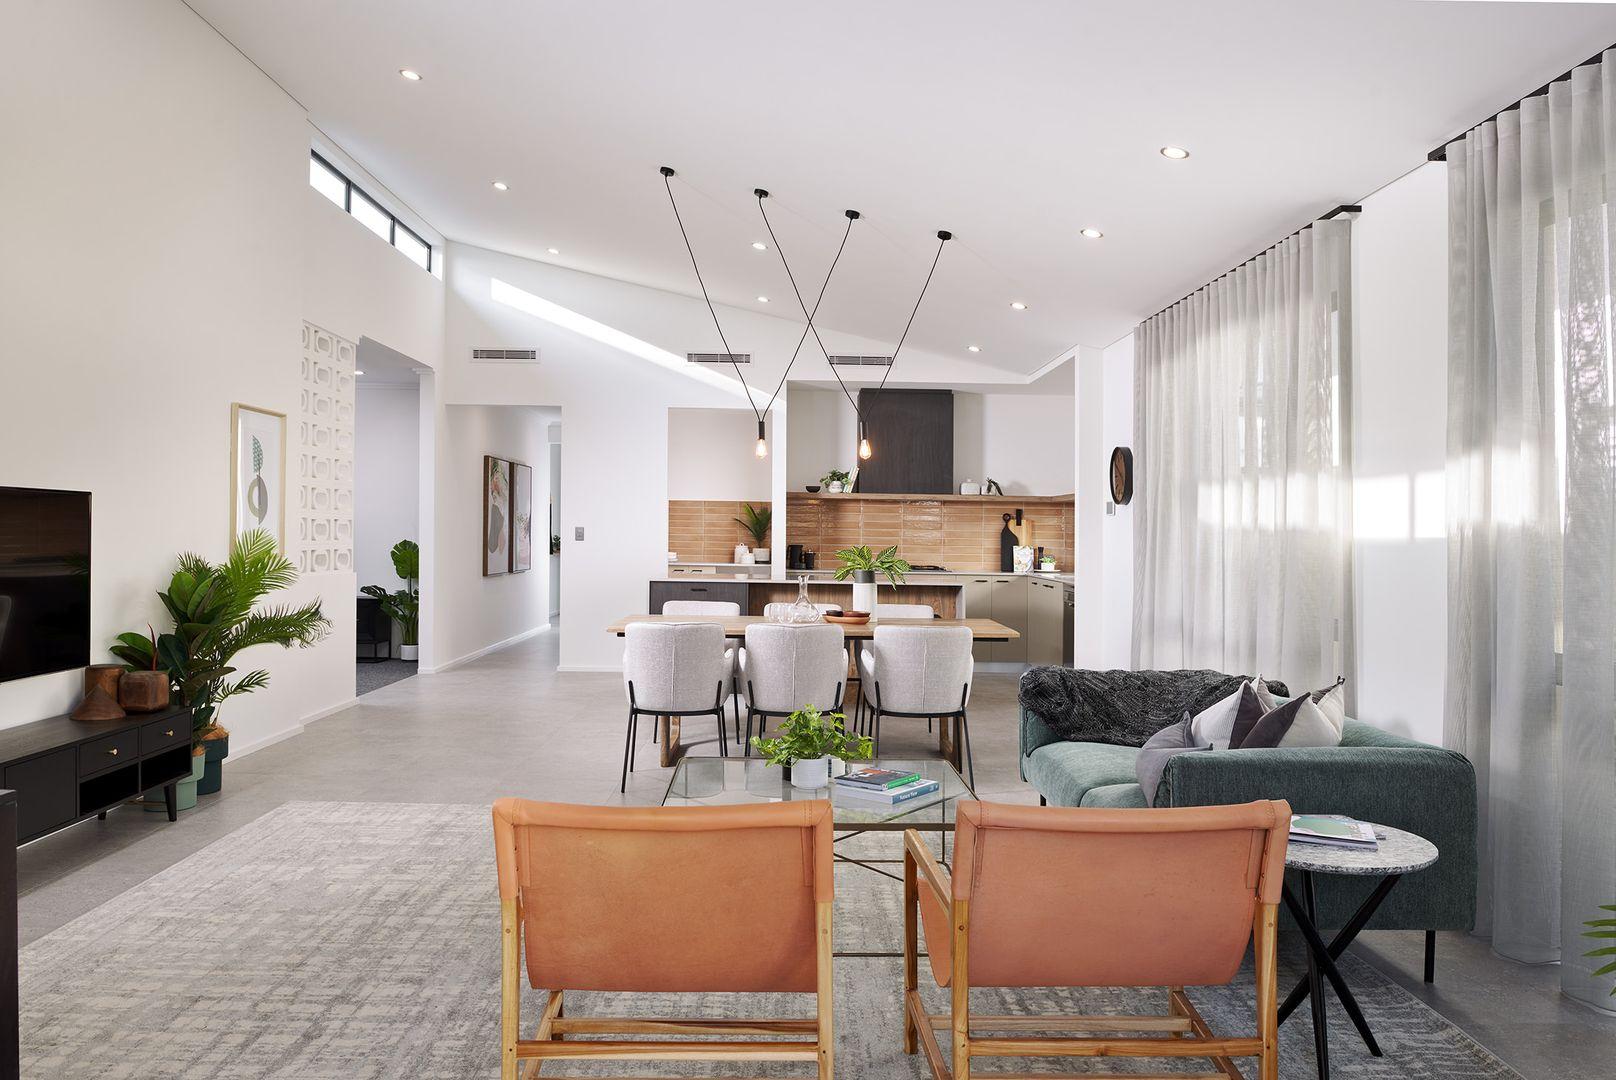 4 bedrooms New House & Land in Lot 1411 Umina Way ALKIMOS WA, 6038